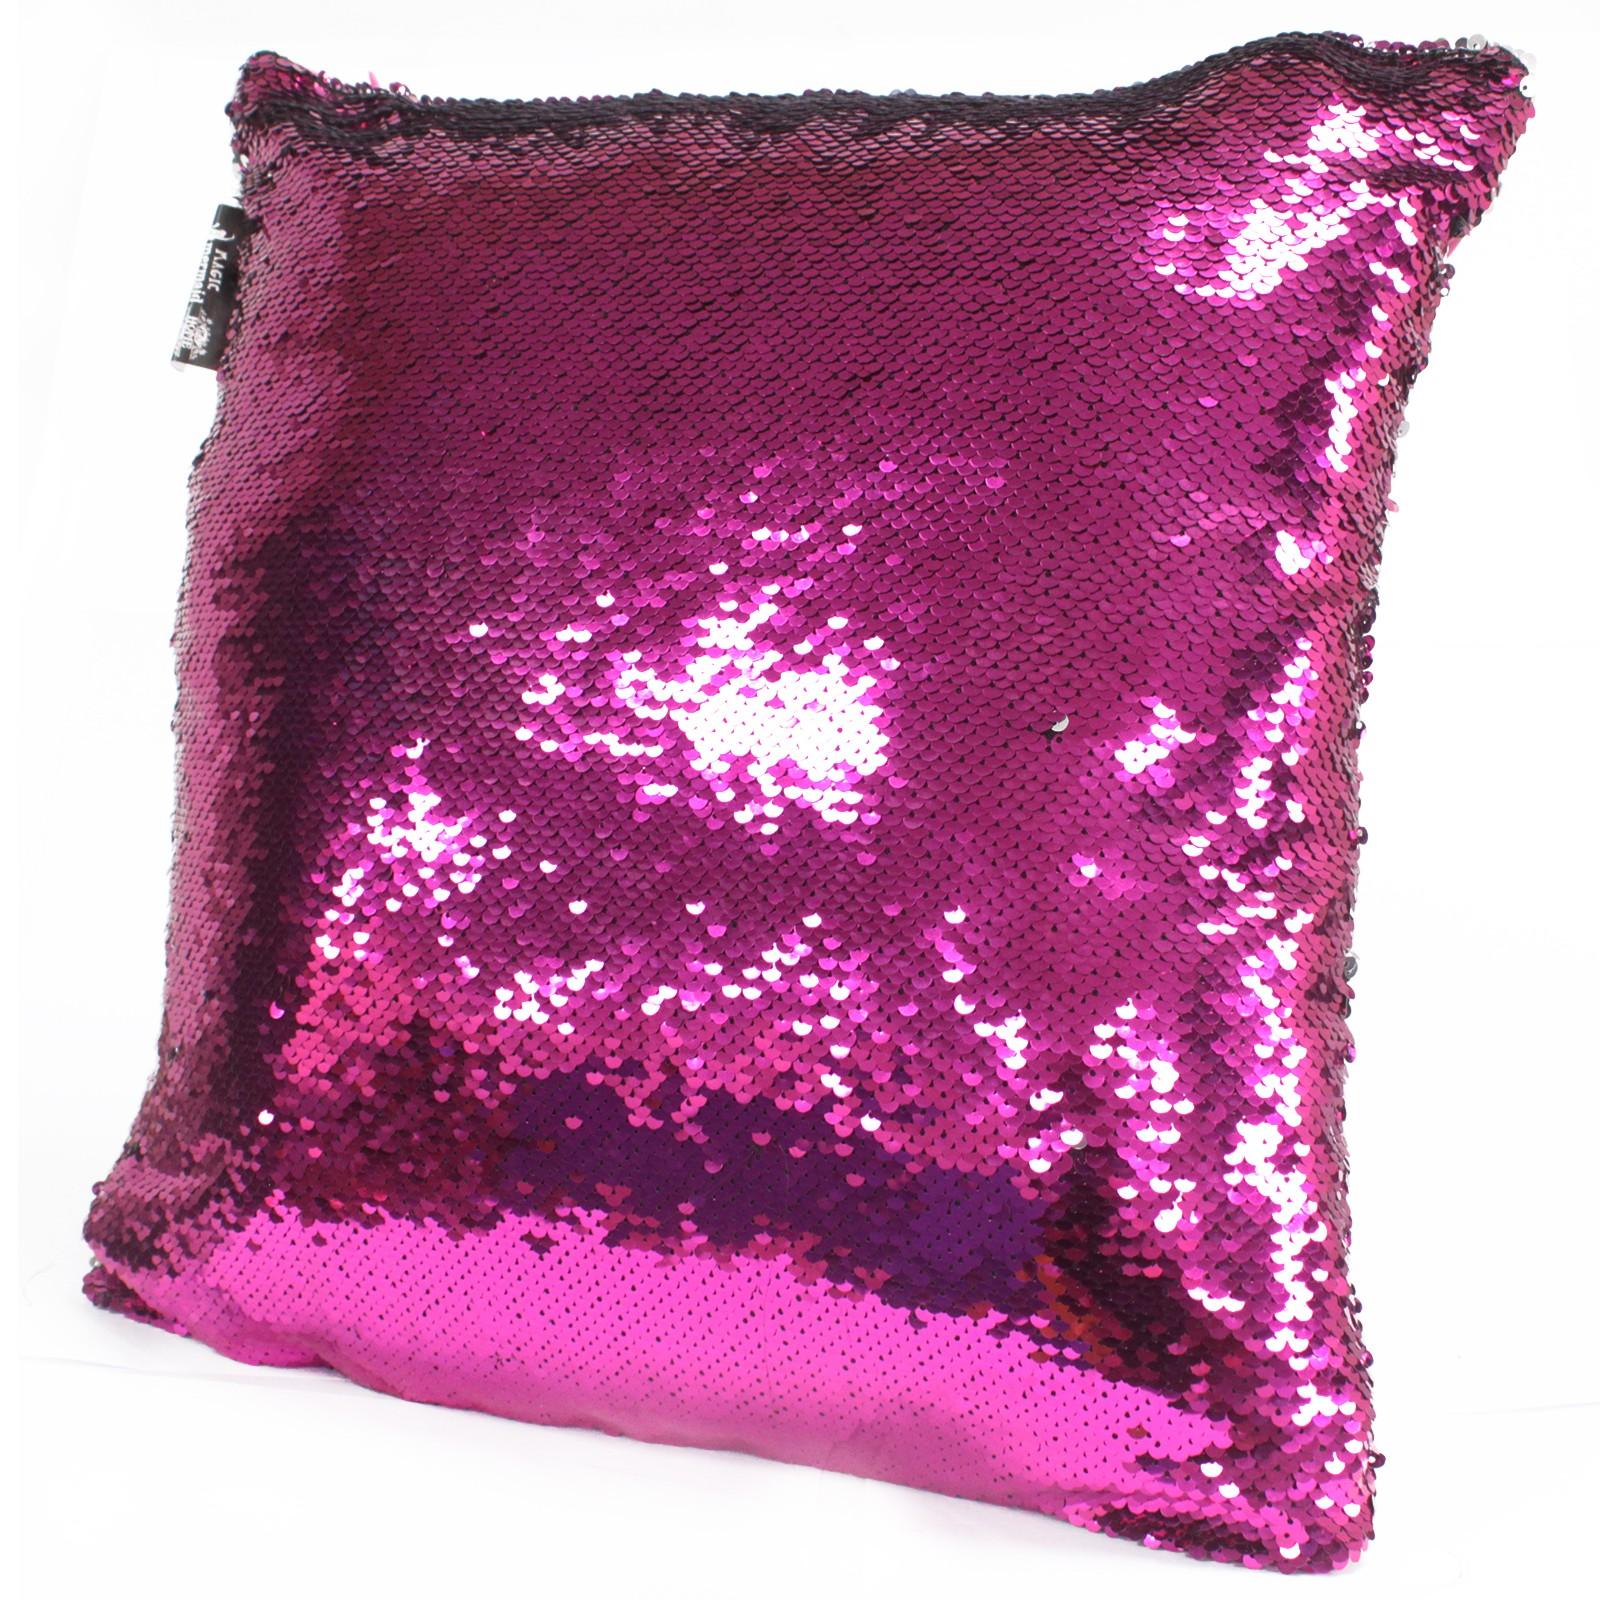 2x Mermaid Cushion Covers - Violet & Silver